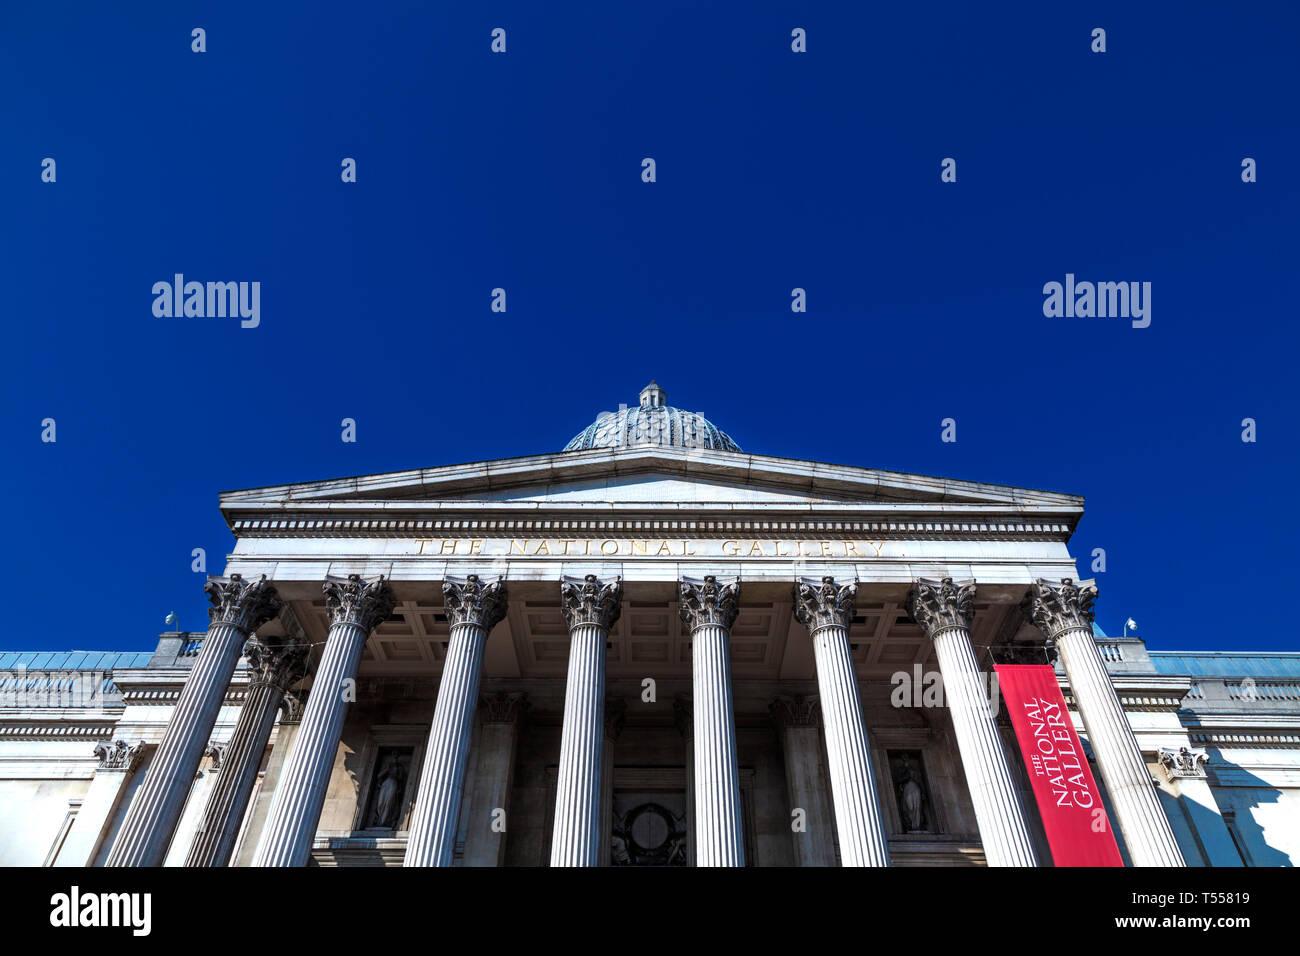 Exterior of the National Museum in Trafalgar Square, London, UK - Stock Image